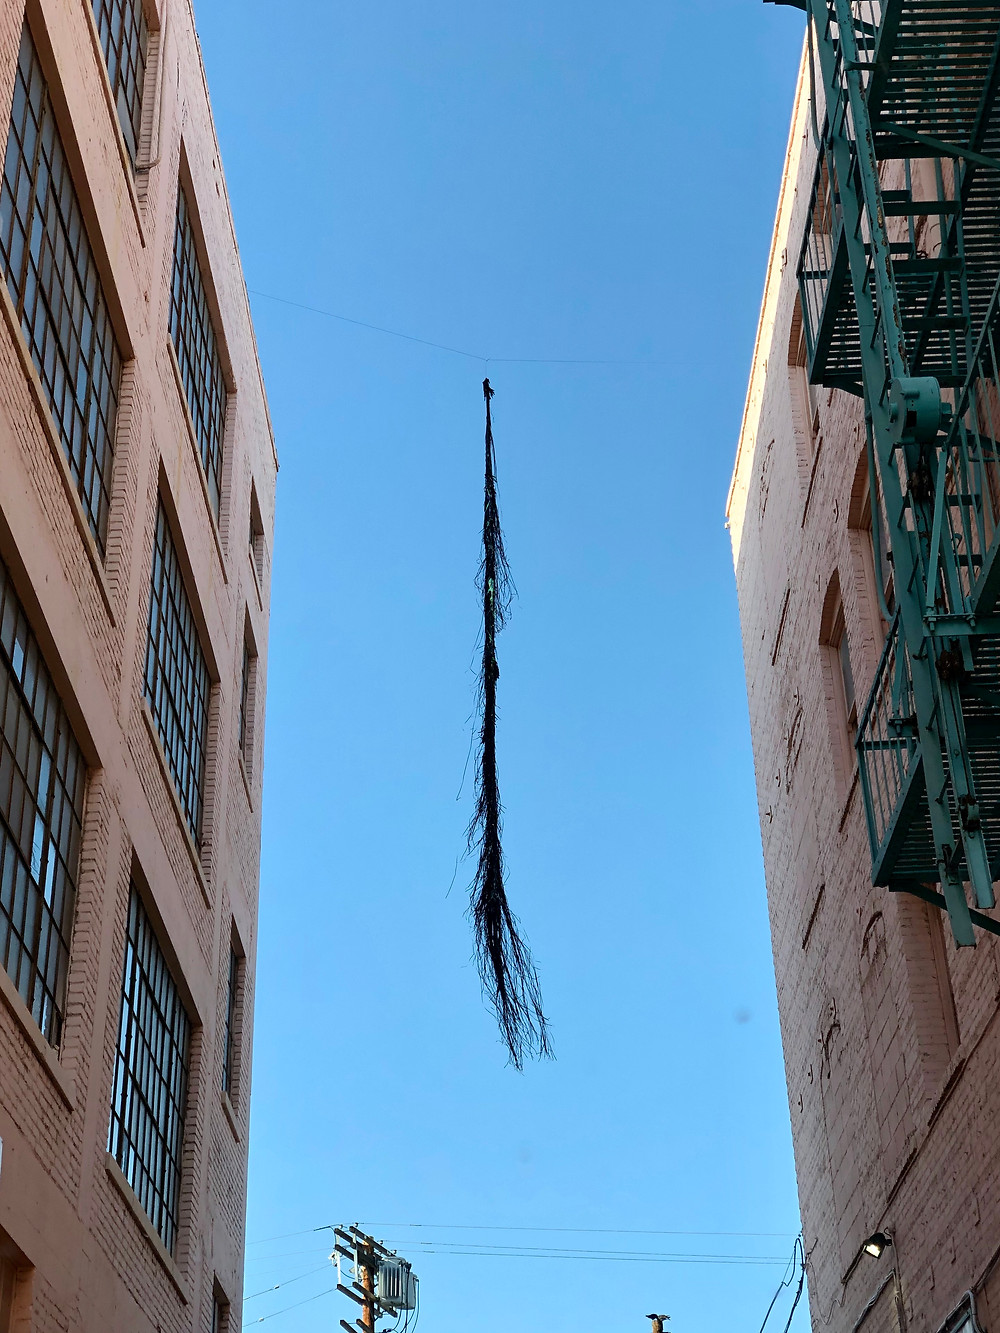 Black material floats between two buildings.